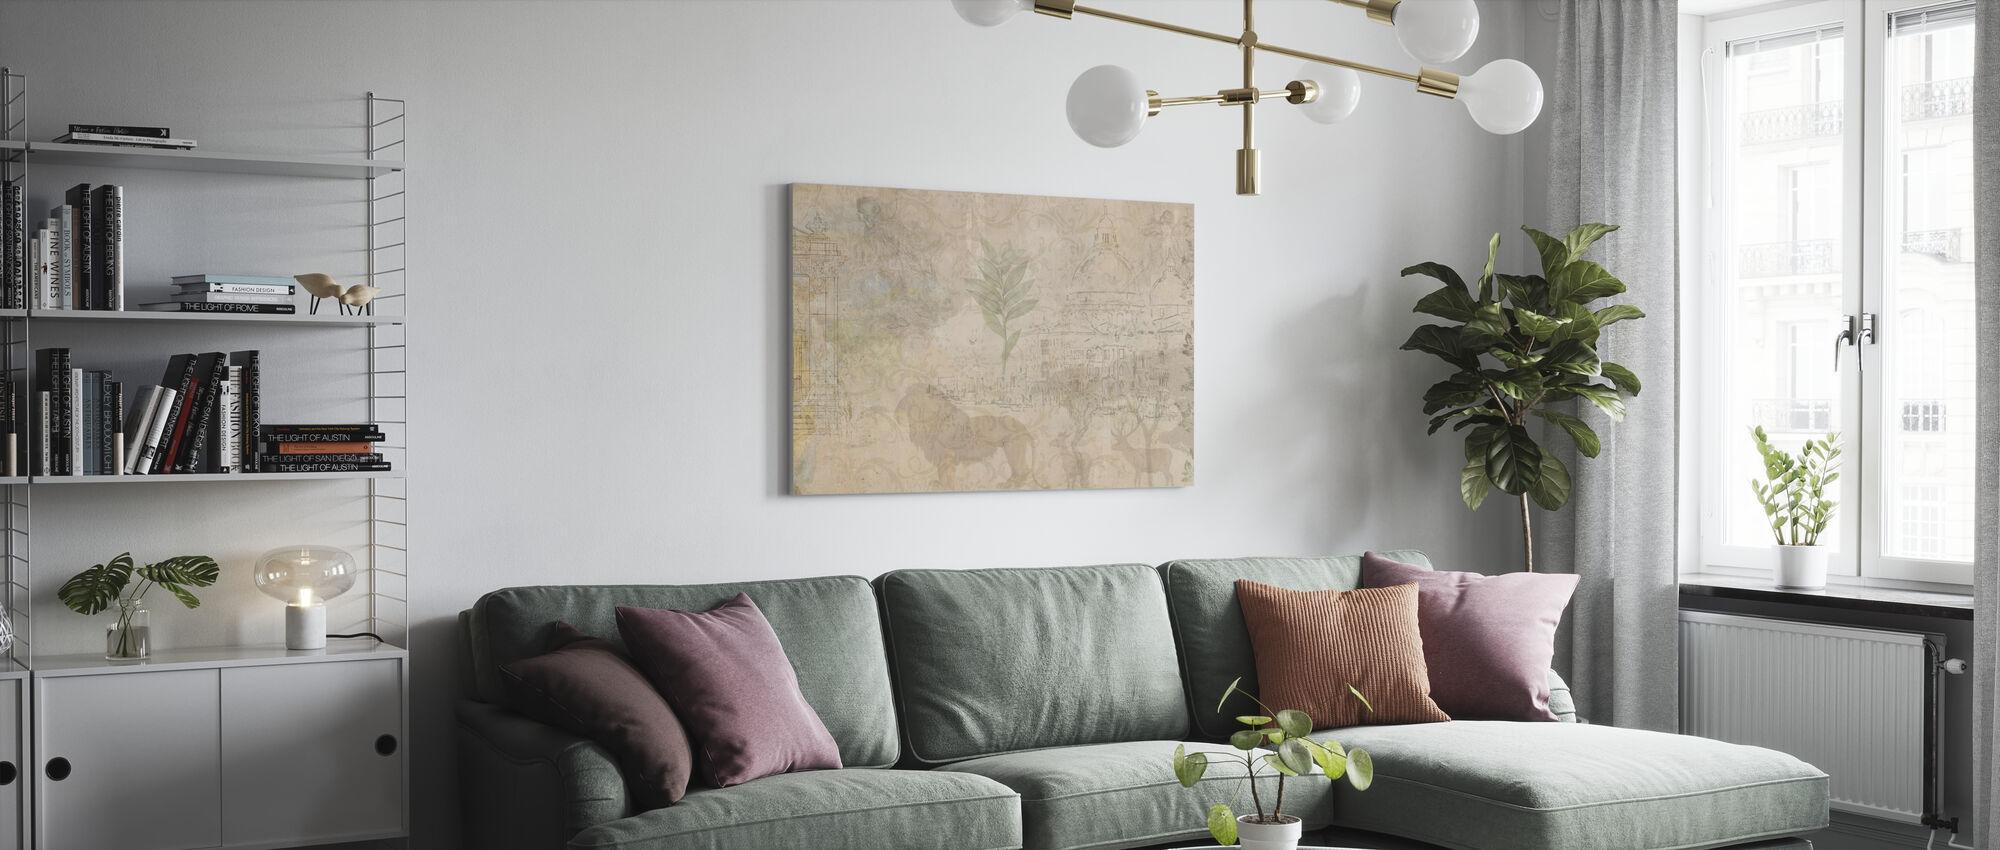 Reminiscence Series Safari - Canvas print - Living Room